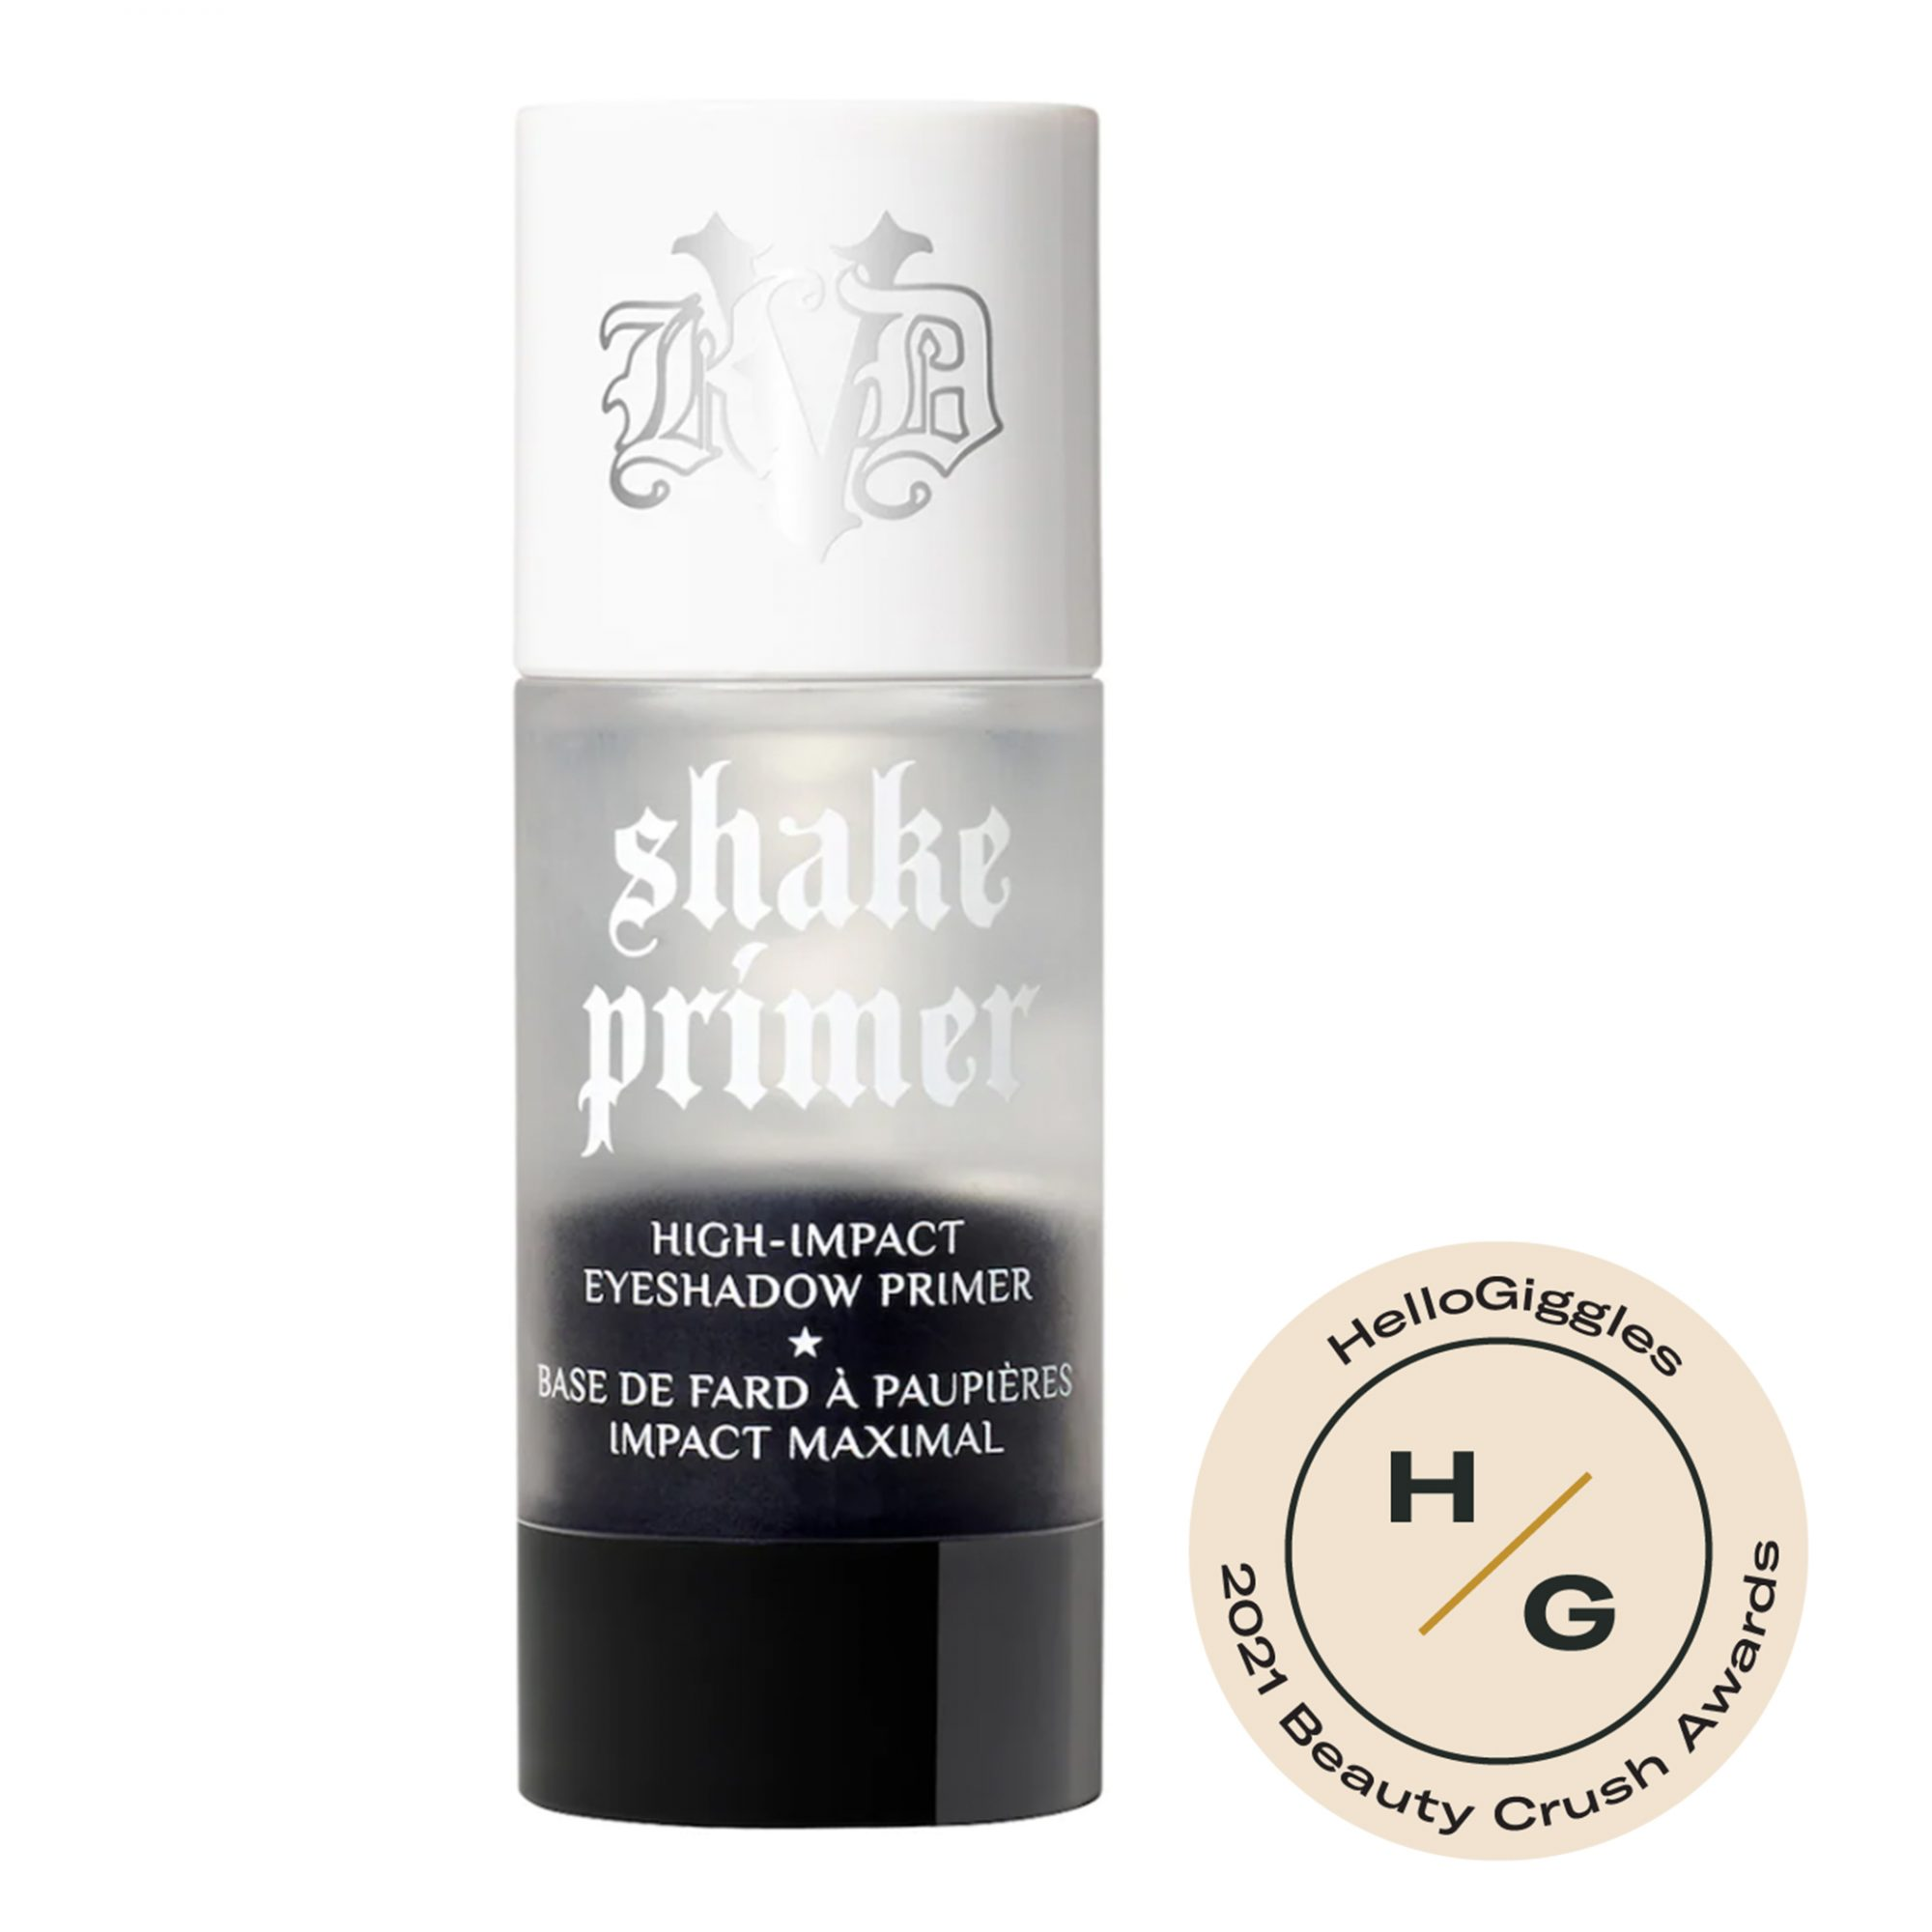 kvd-high-impact-eyeshadow-primer